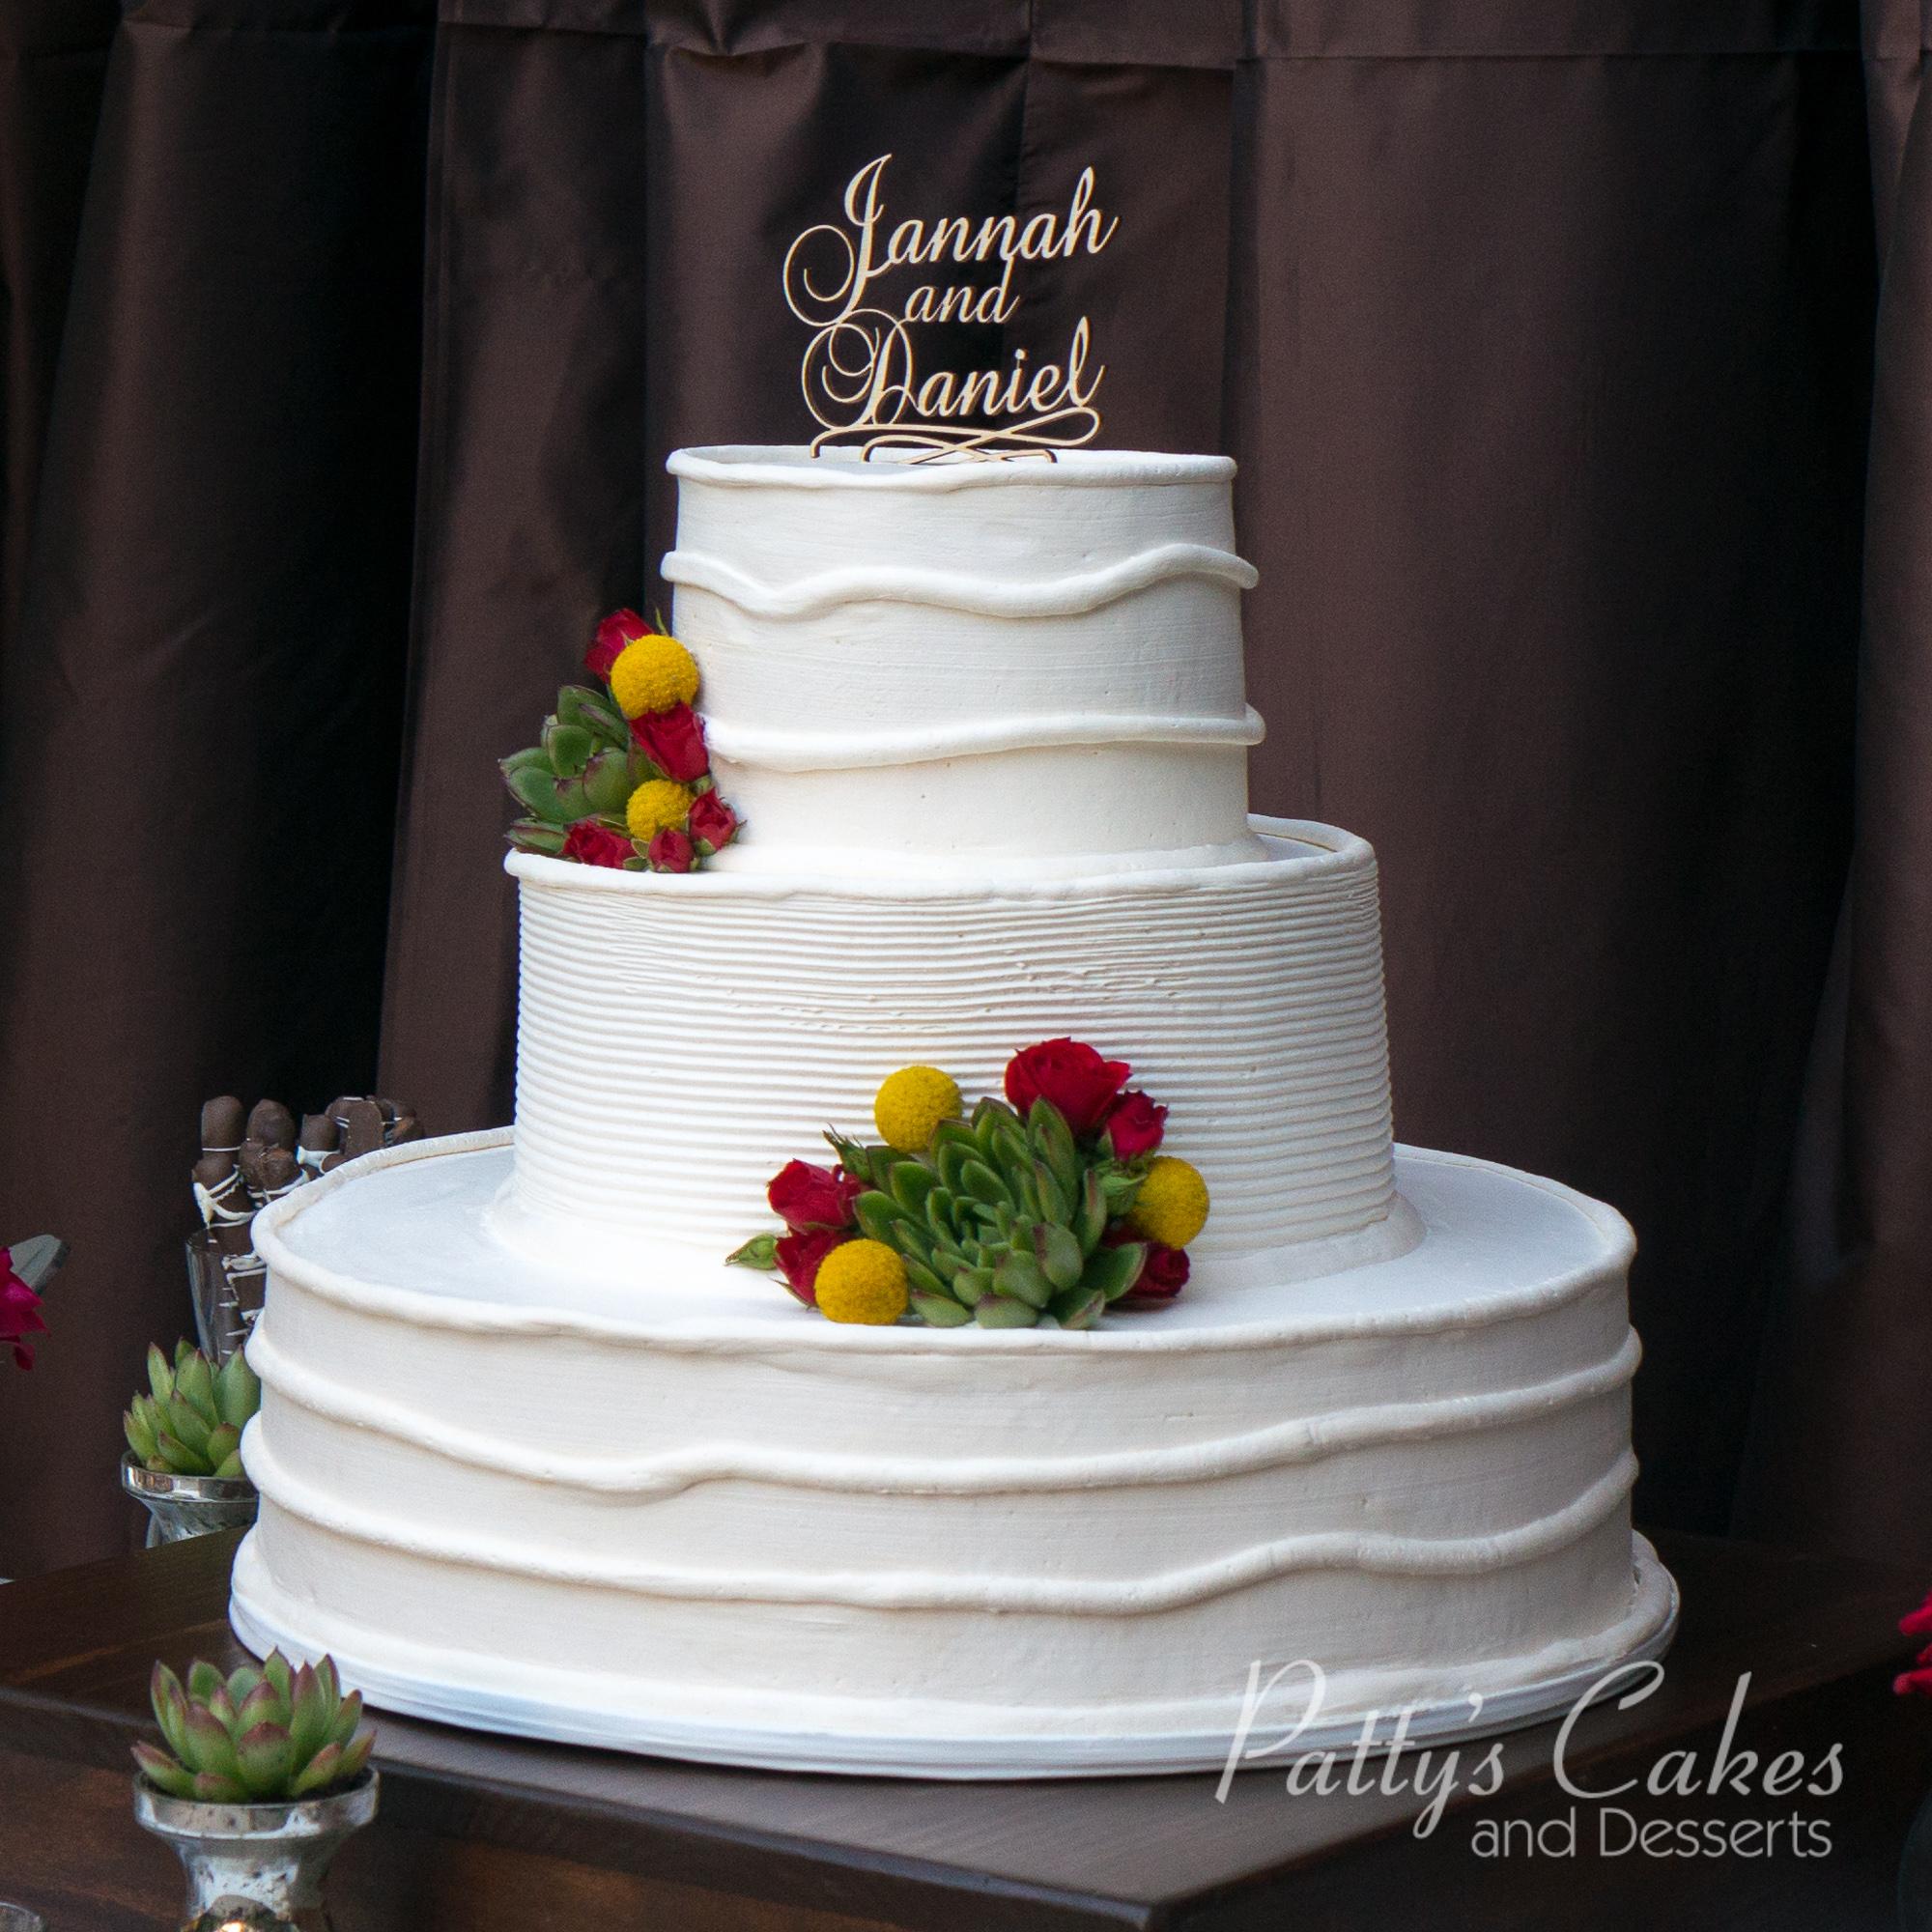 Outdoor Wedding Cake Ideas: Photo Of A White Outdoor Wedding Cake